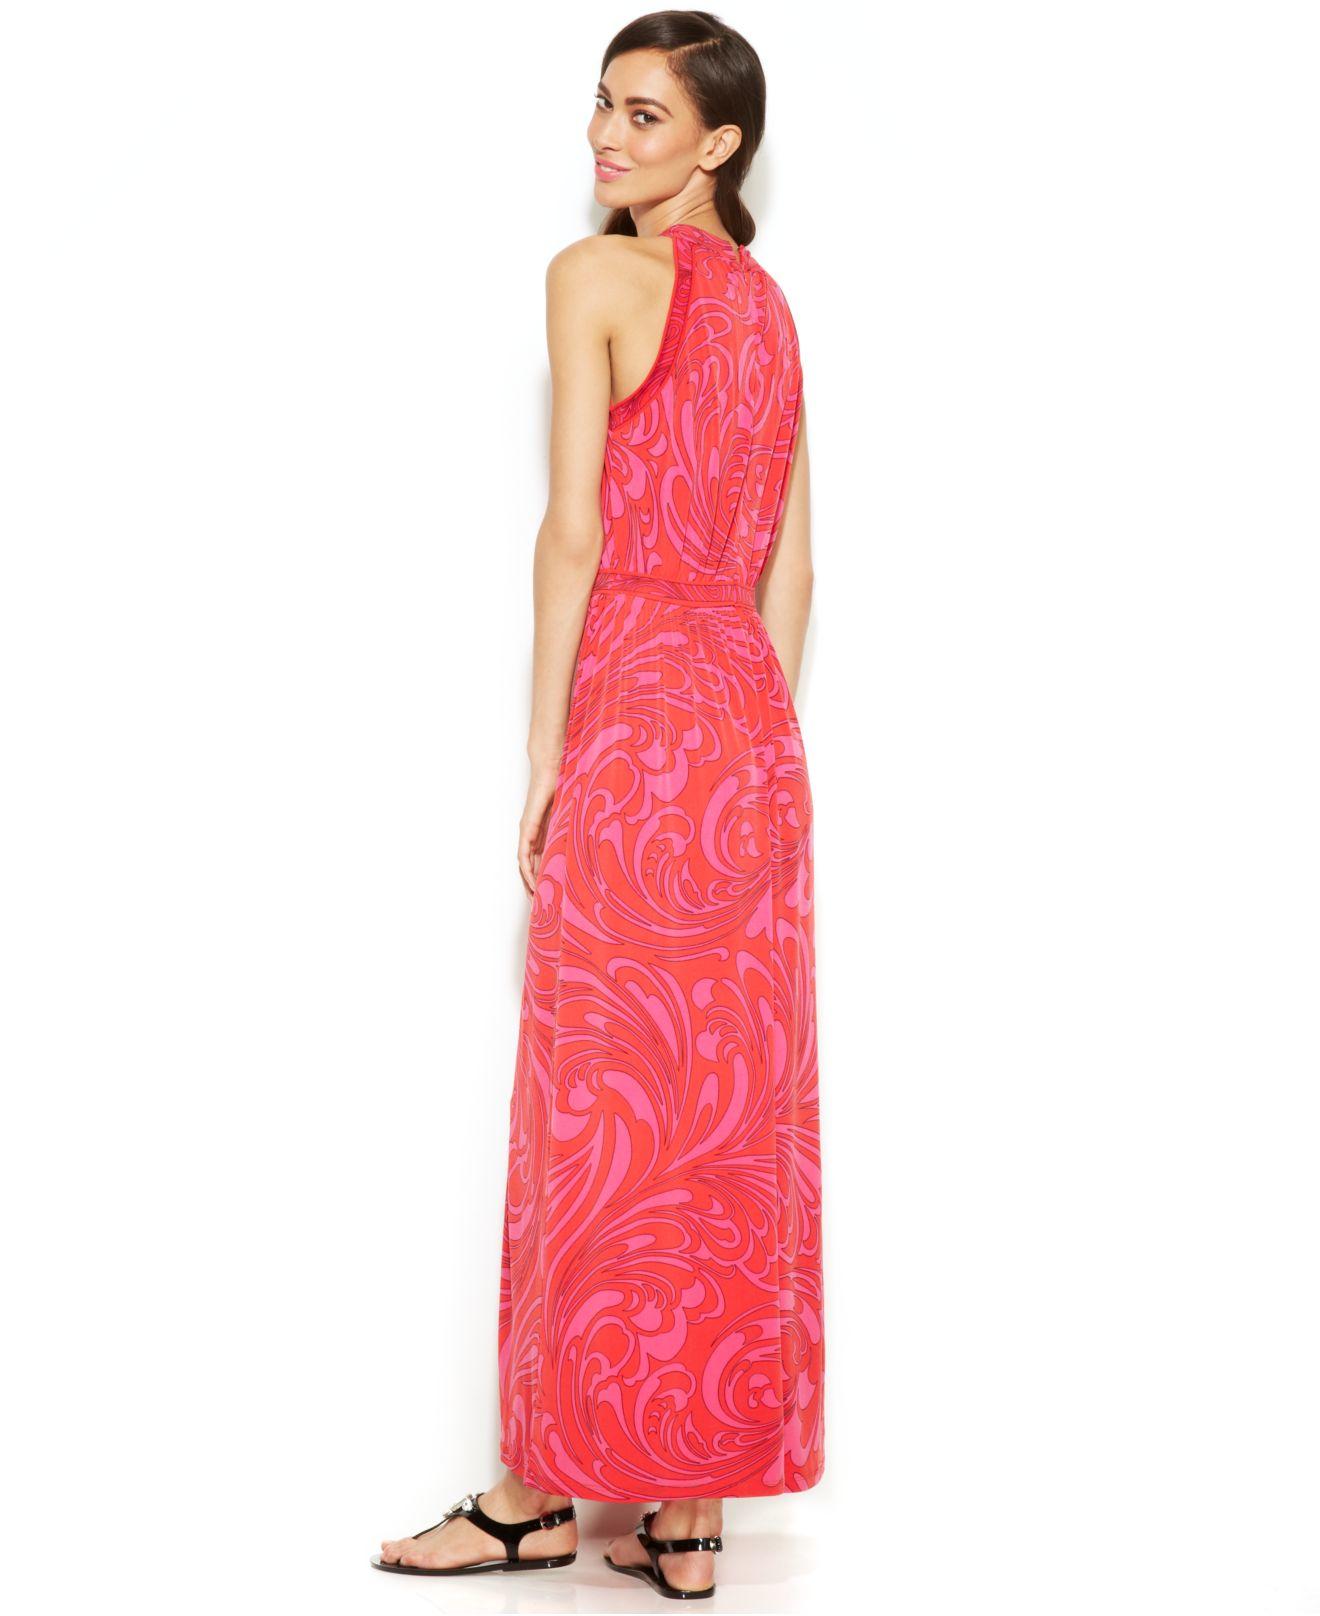 Cheap prom dresses 75 off michael kors – Woman best dresses